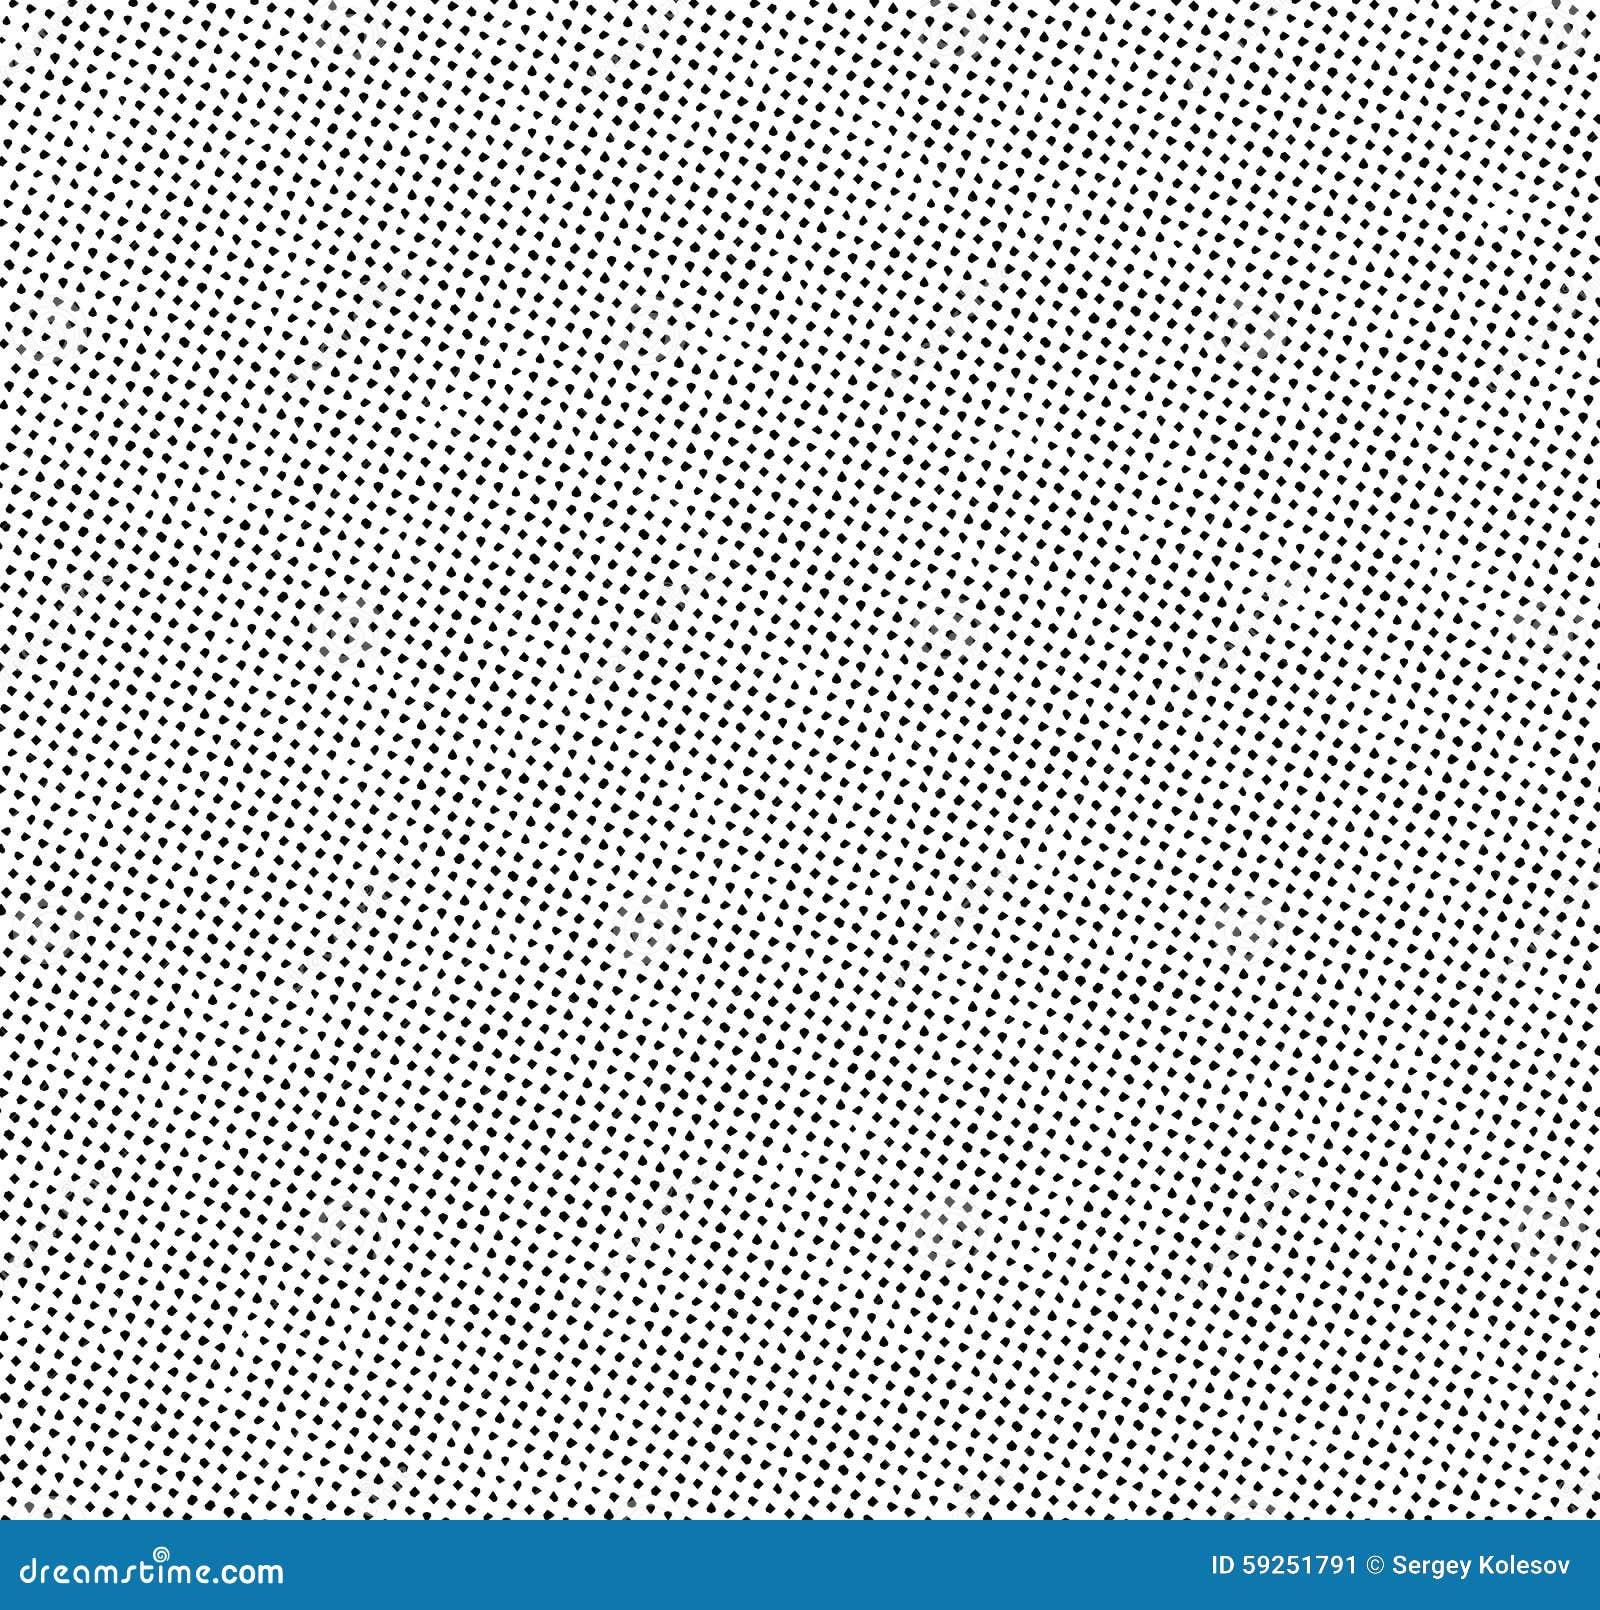 Grunge Halftone Print Pattern Background Stock Vector